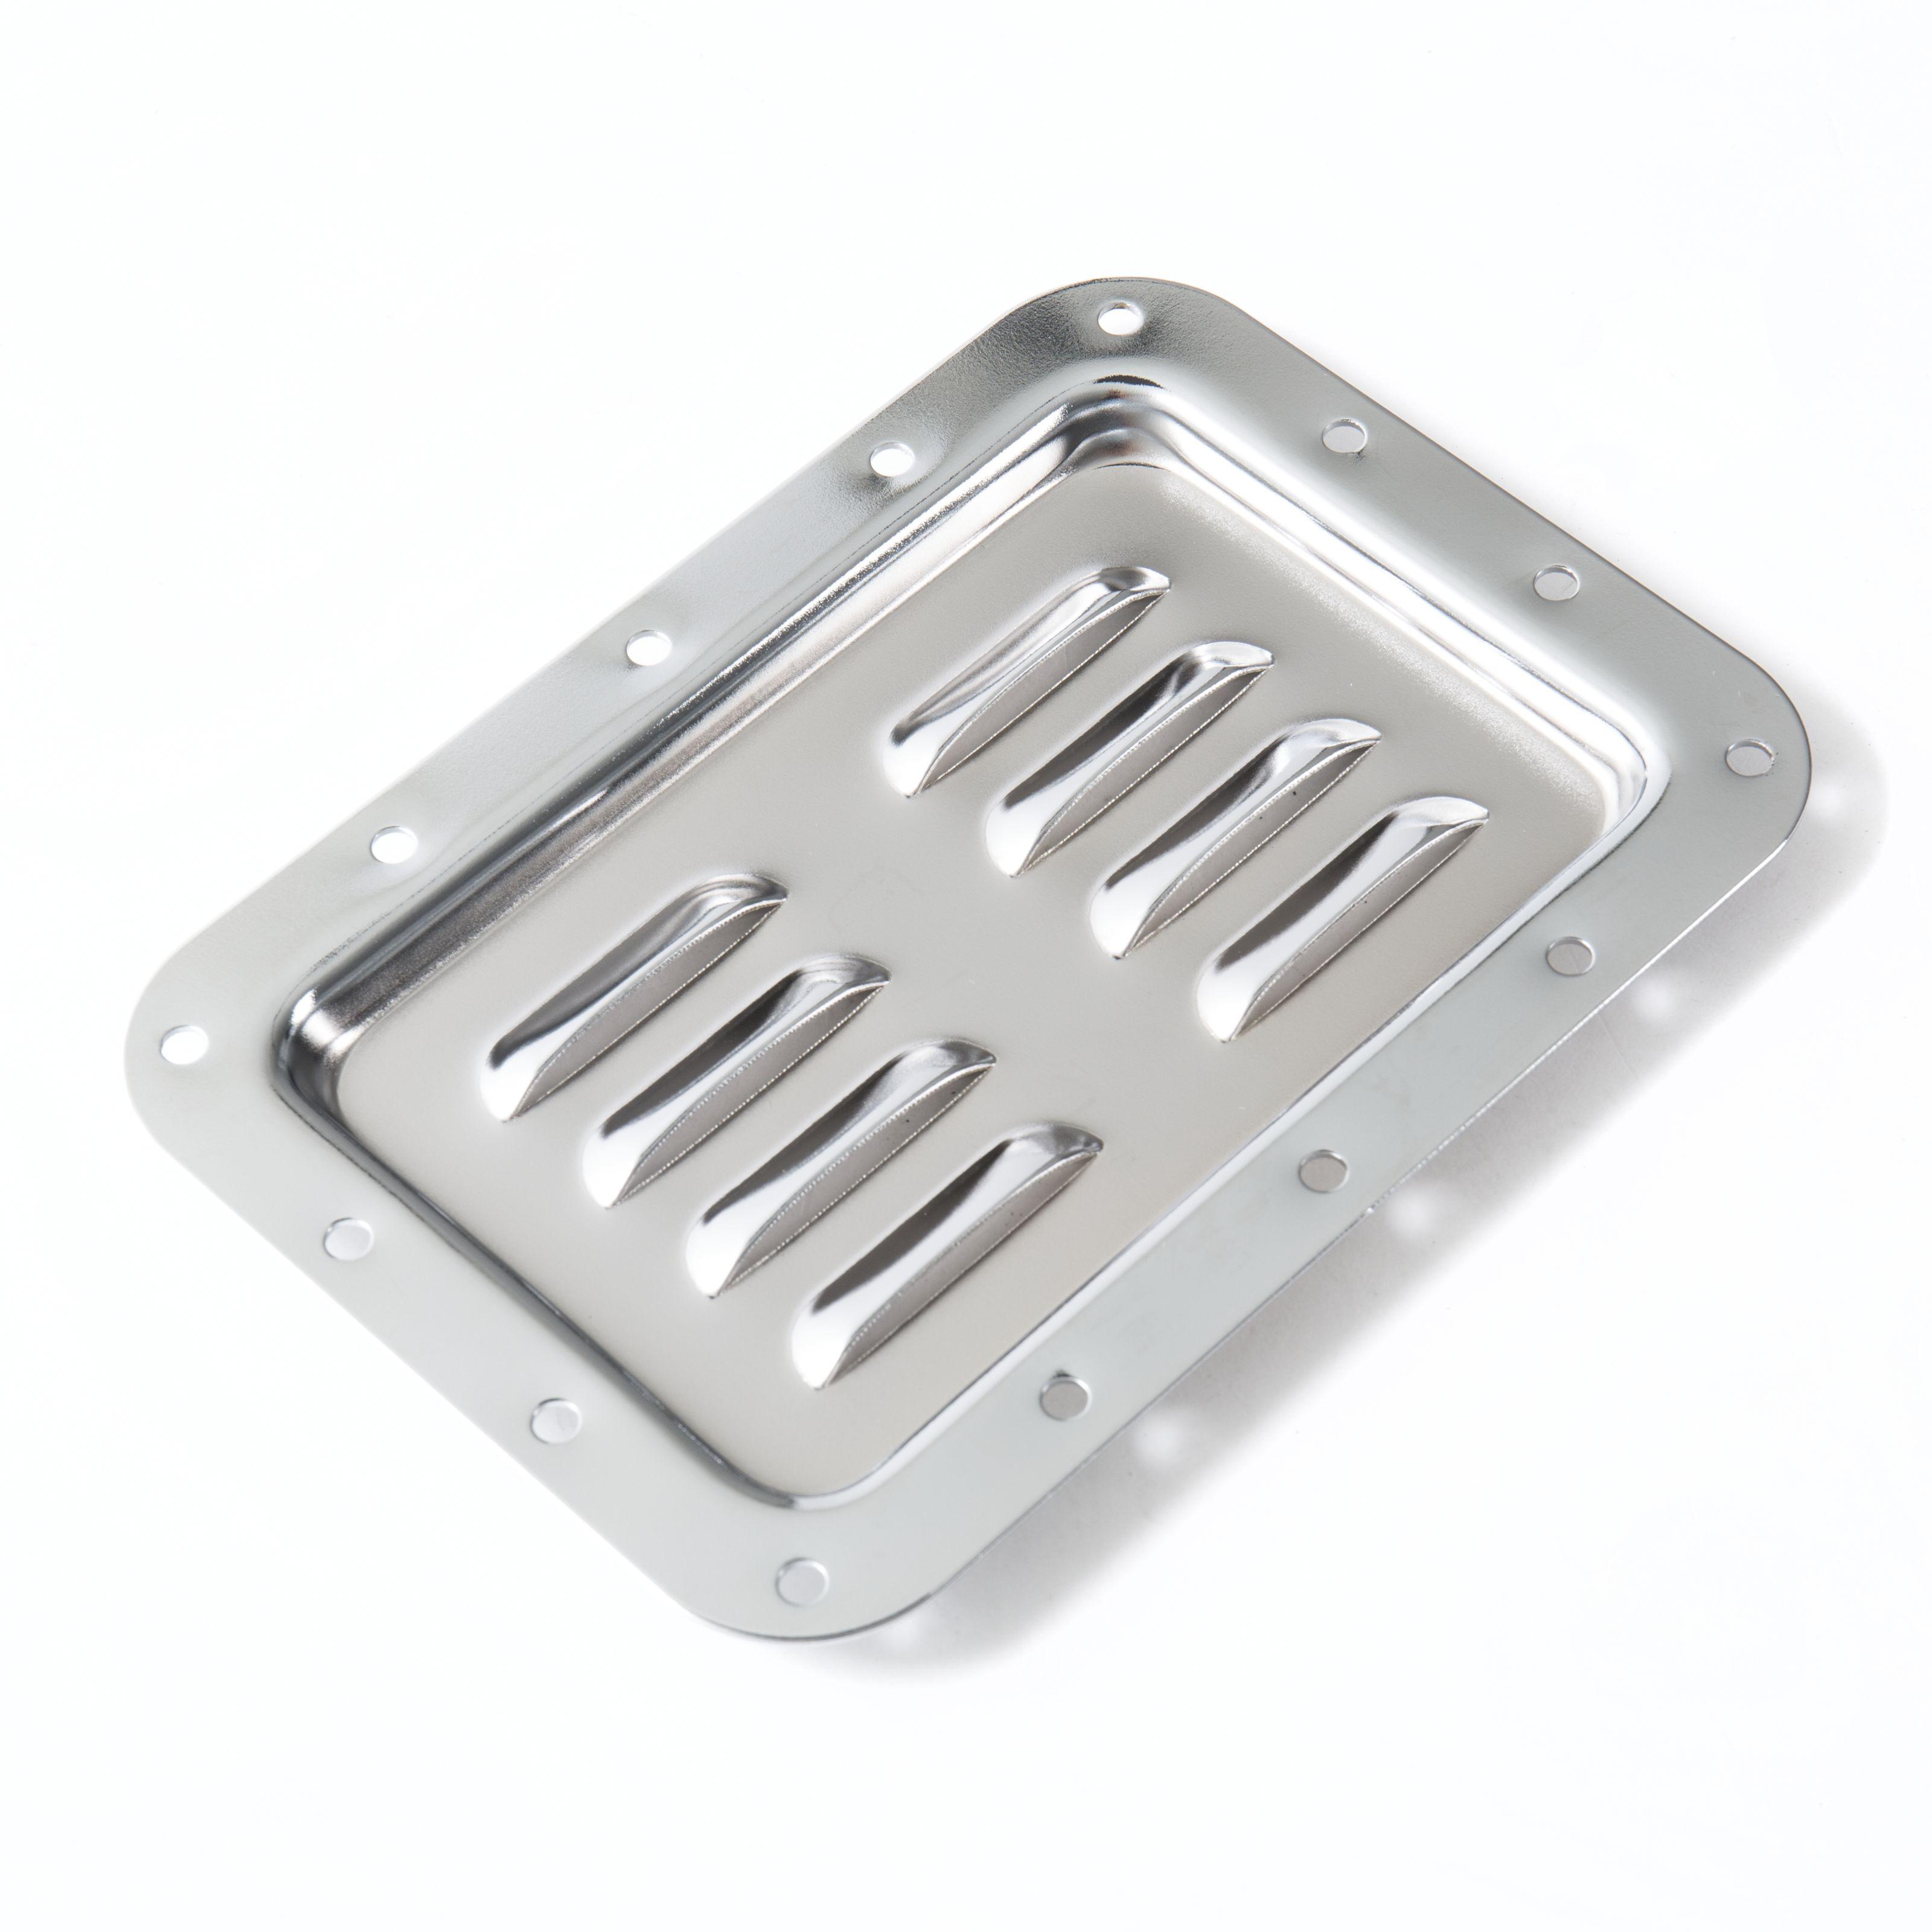 MUSIC STORE - Ventilation Dish Large SP-61